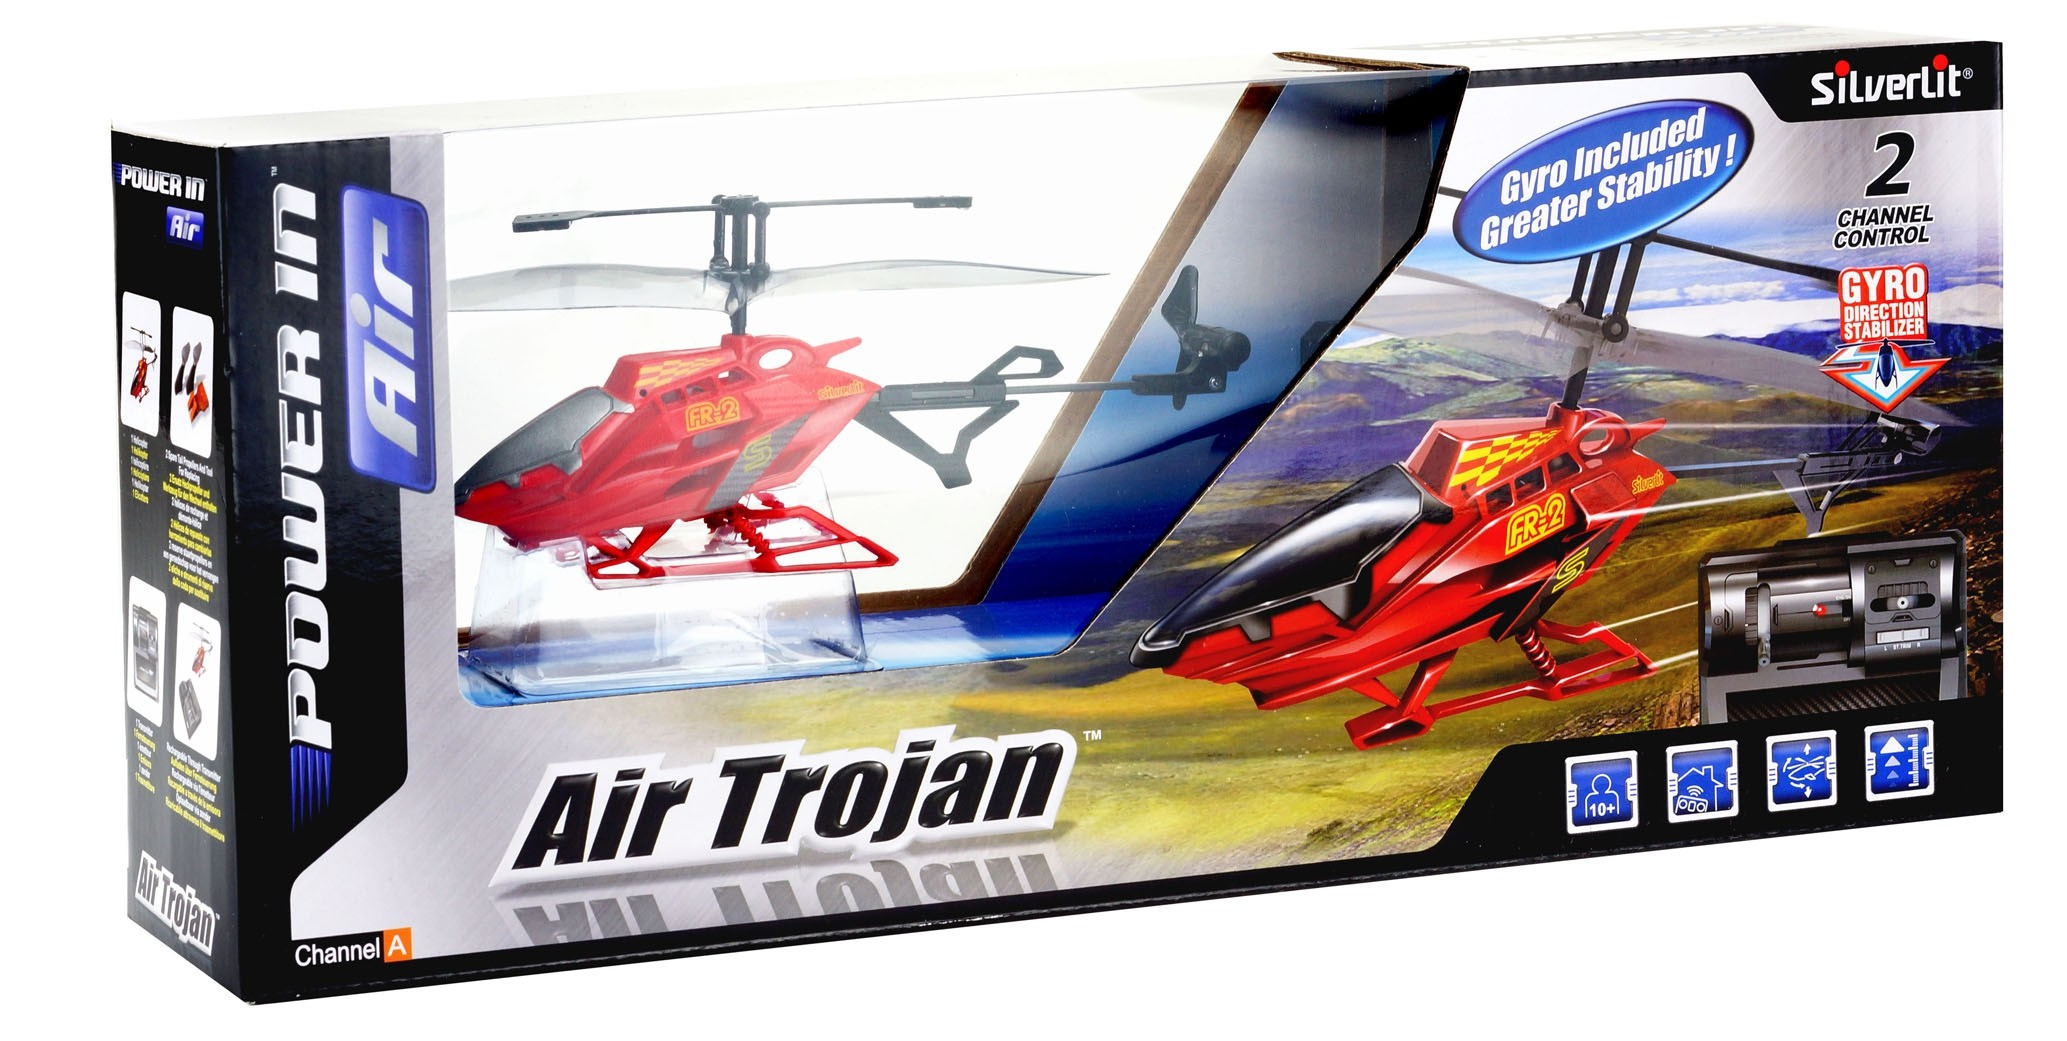 Самолеты и вертолеты Silverlit Air Trojan 2-х канальный